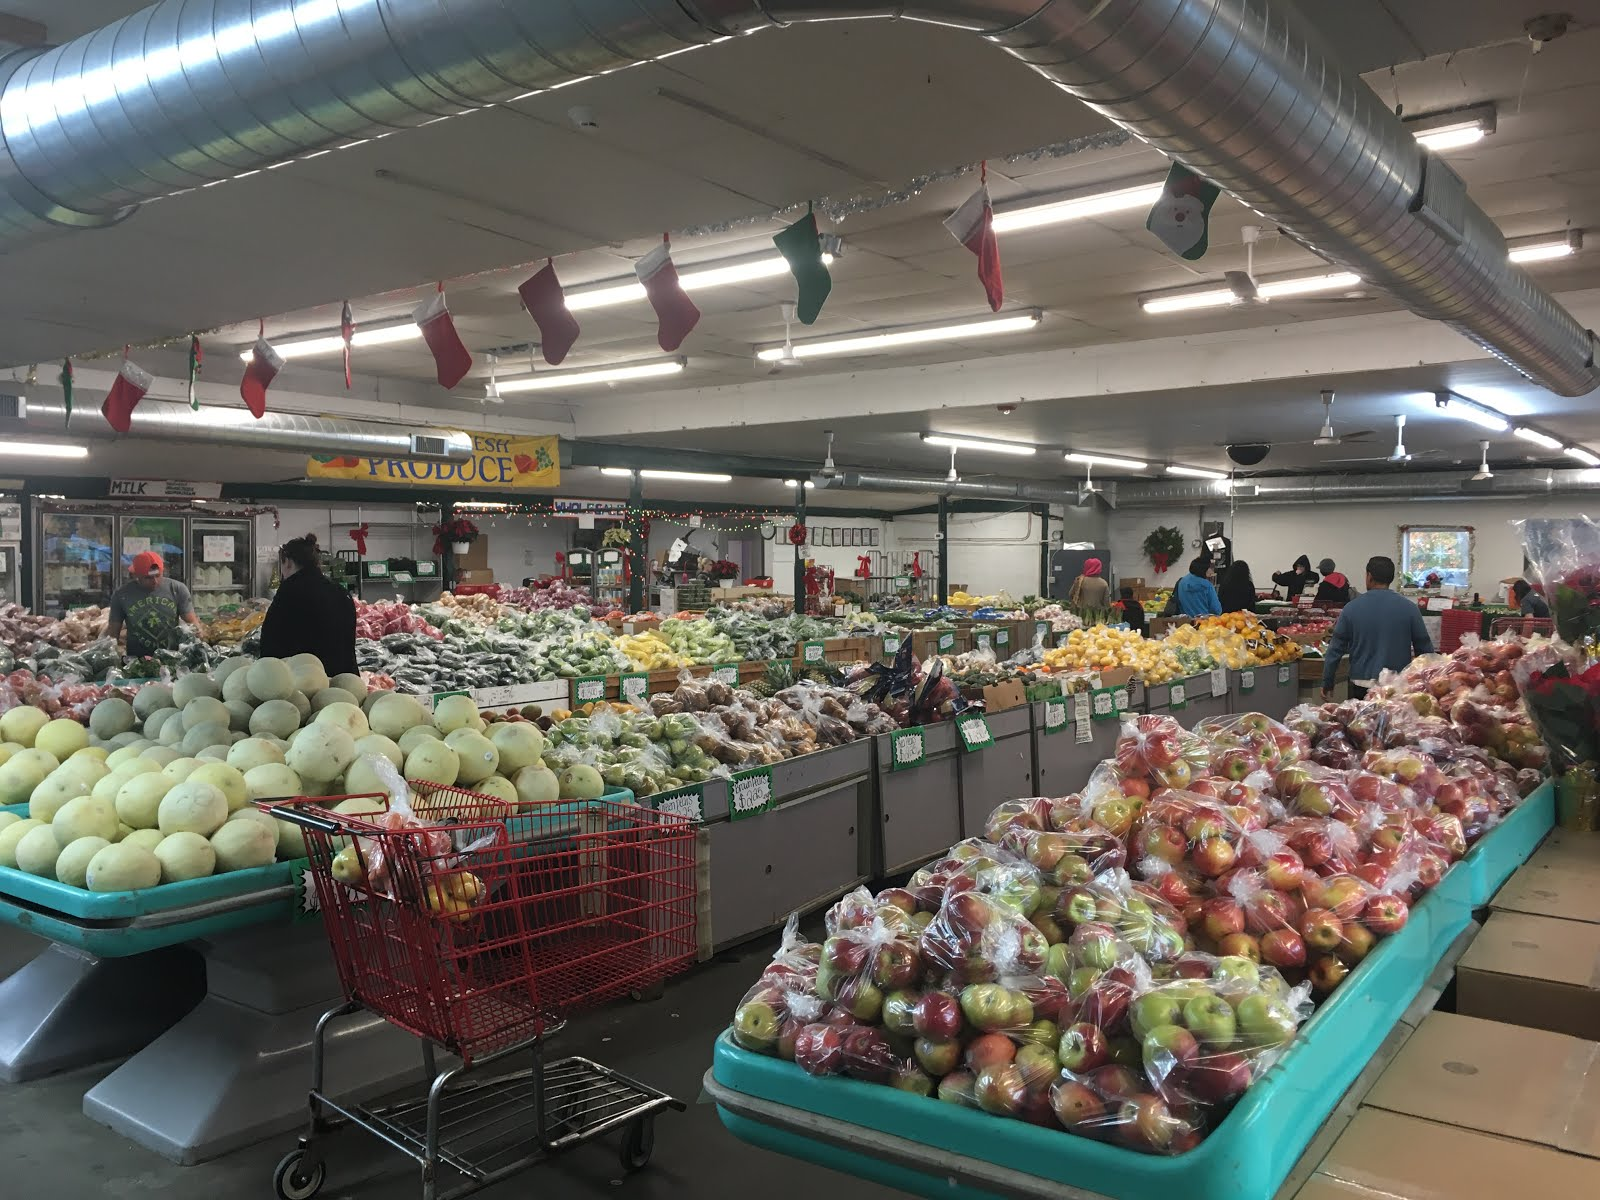 Verchios Produce Market